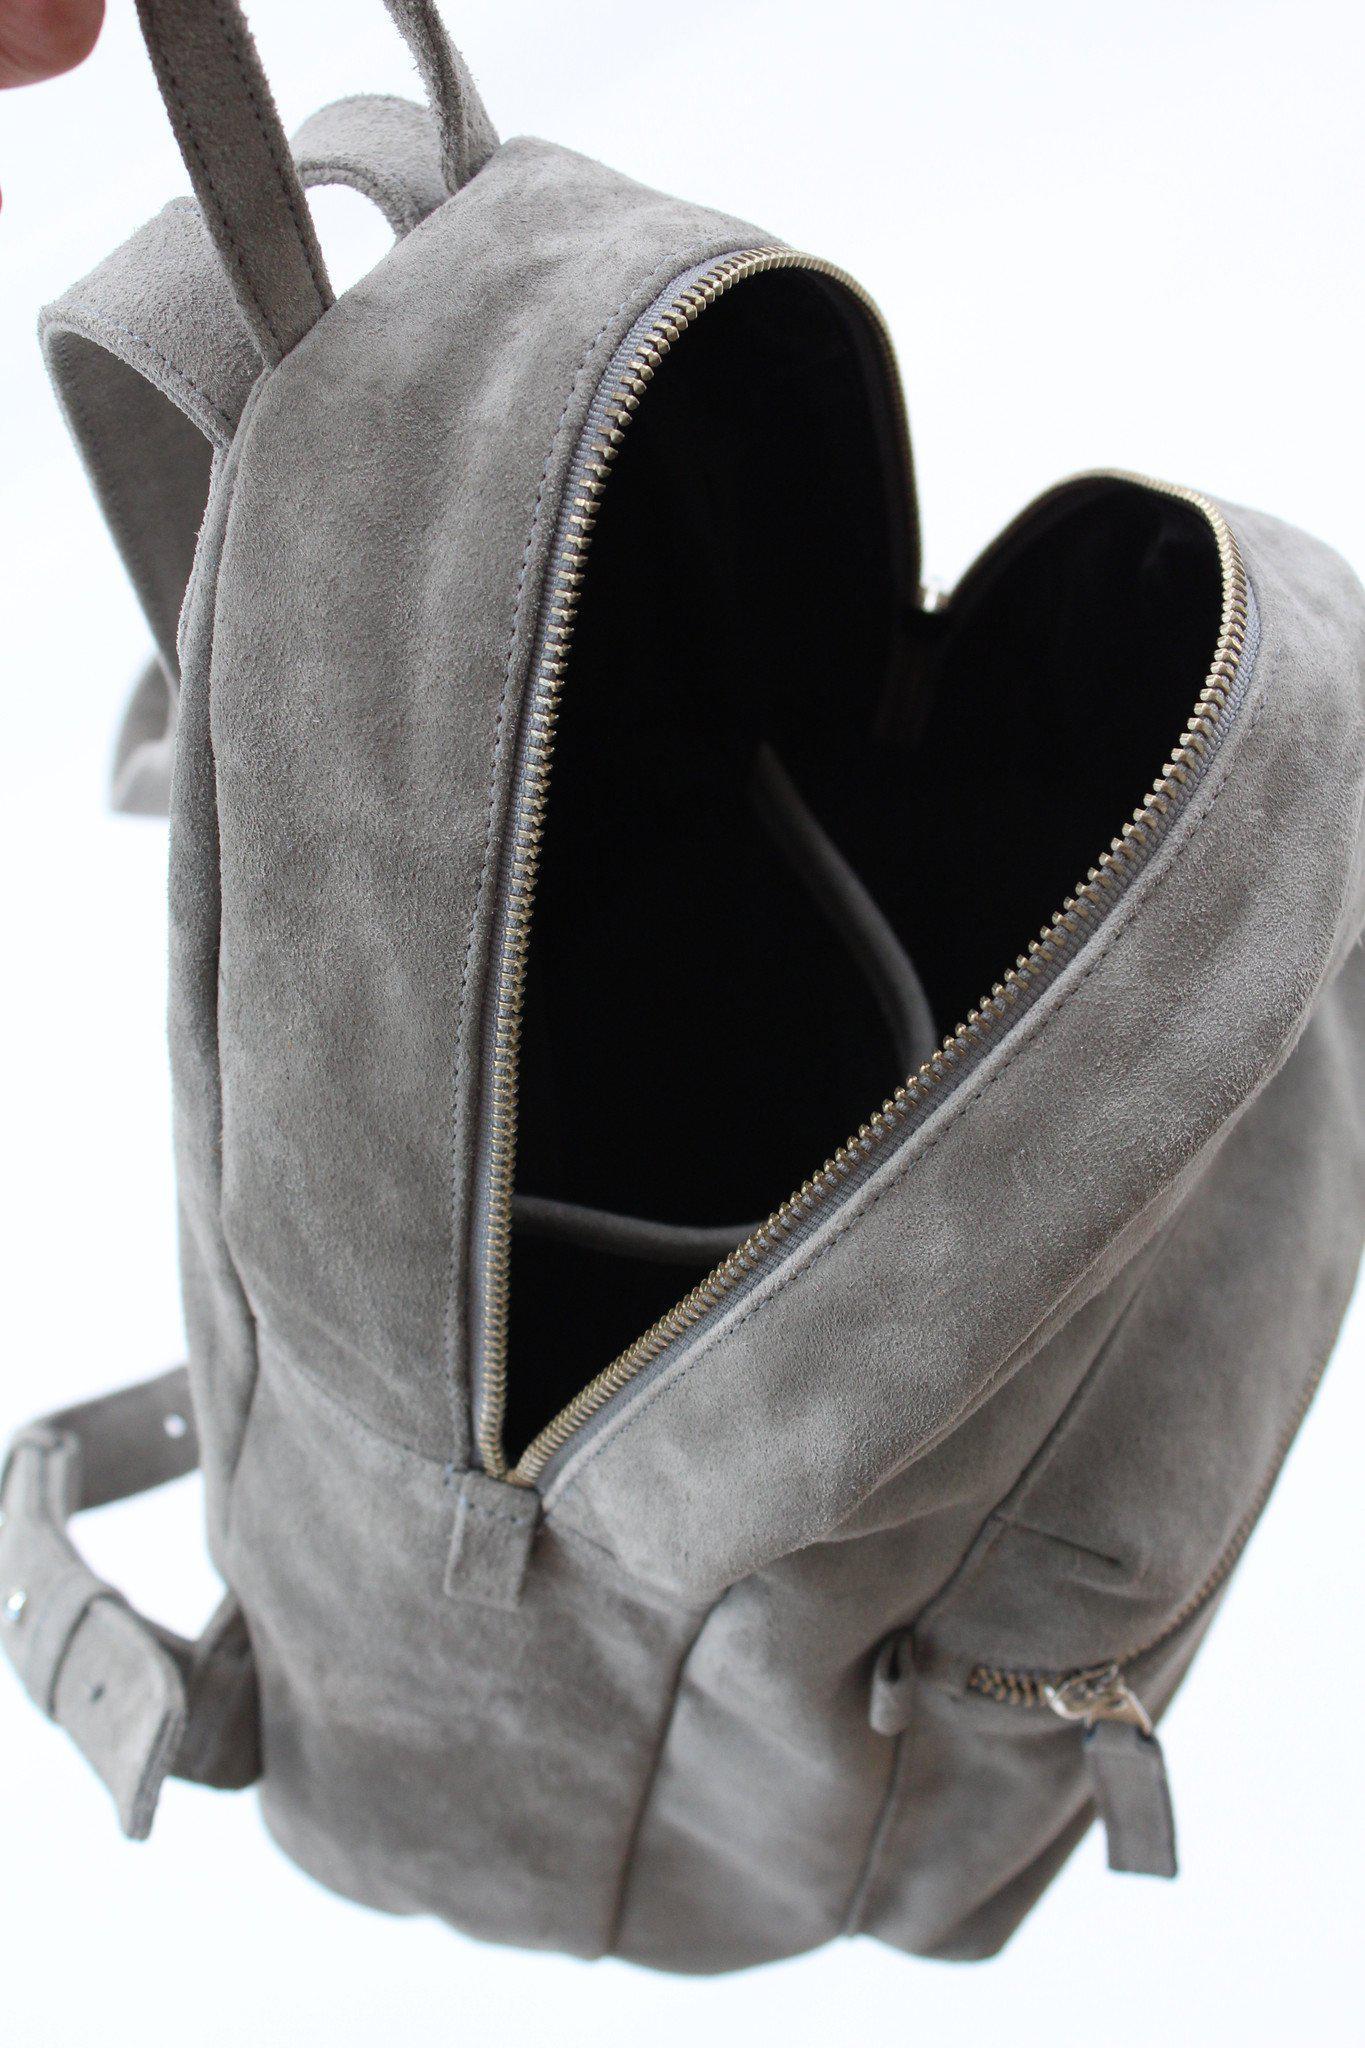 071fac3ac7 https   www.lyst.com clothing karen-kane-applique-sleeve-sweatshirt-2 ...